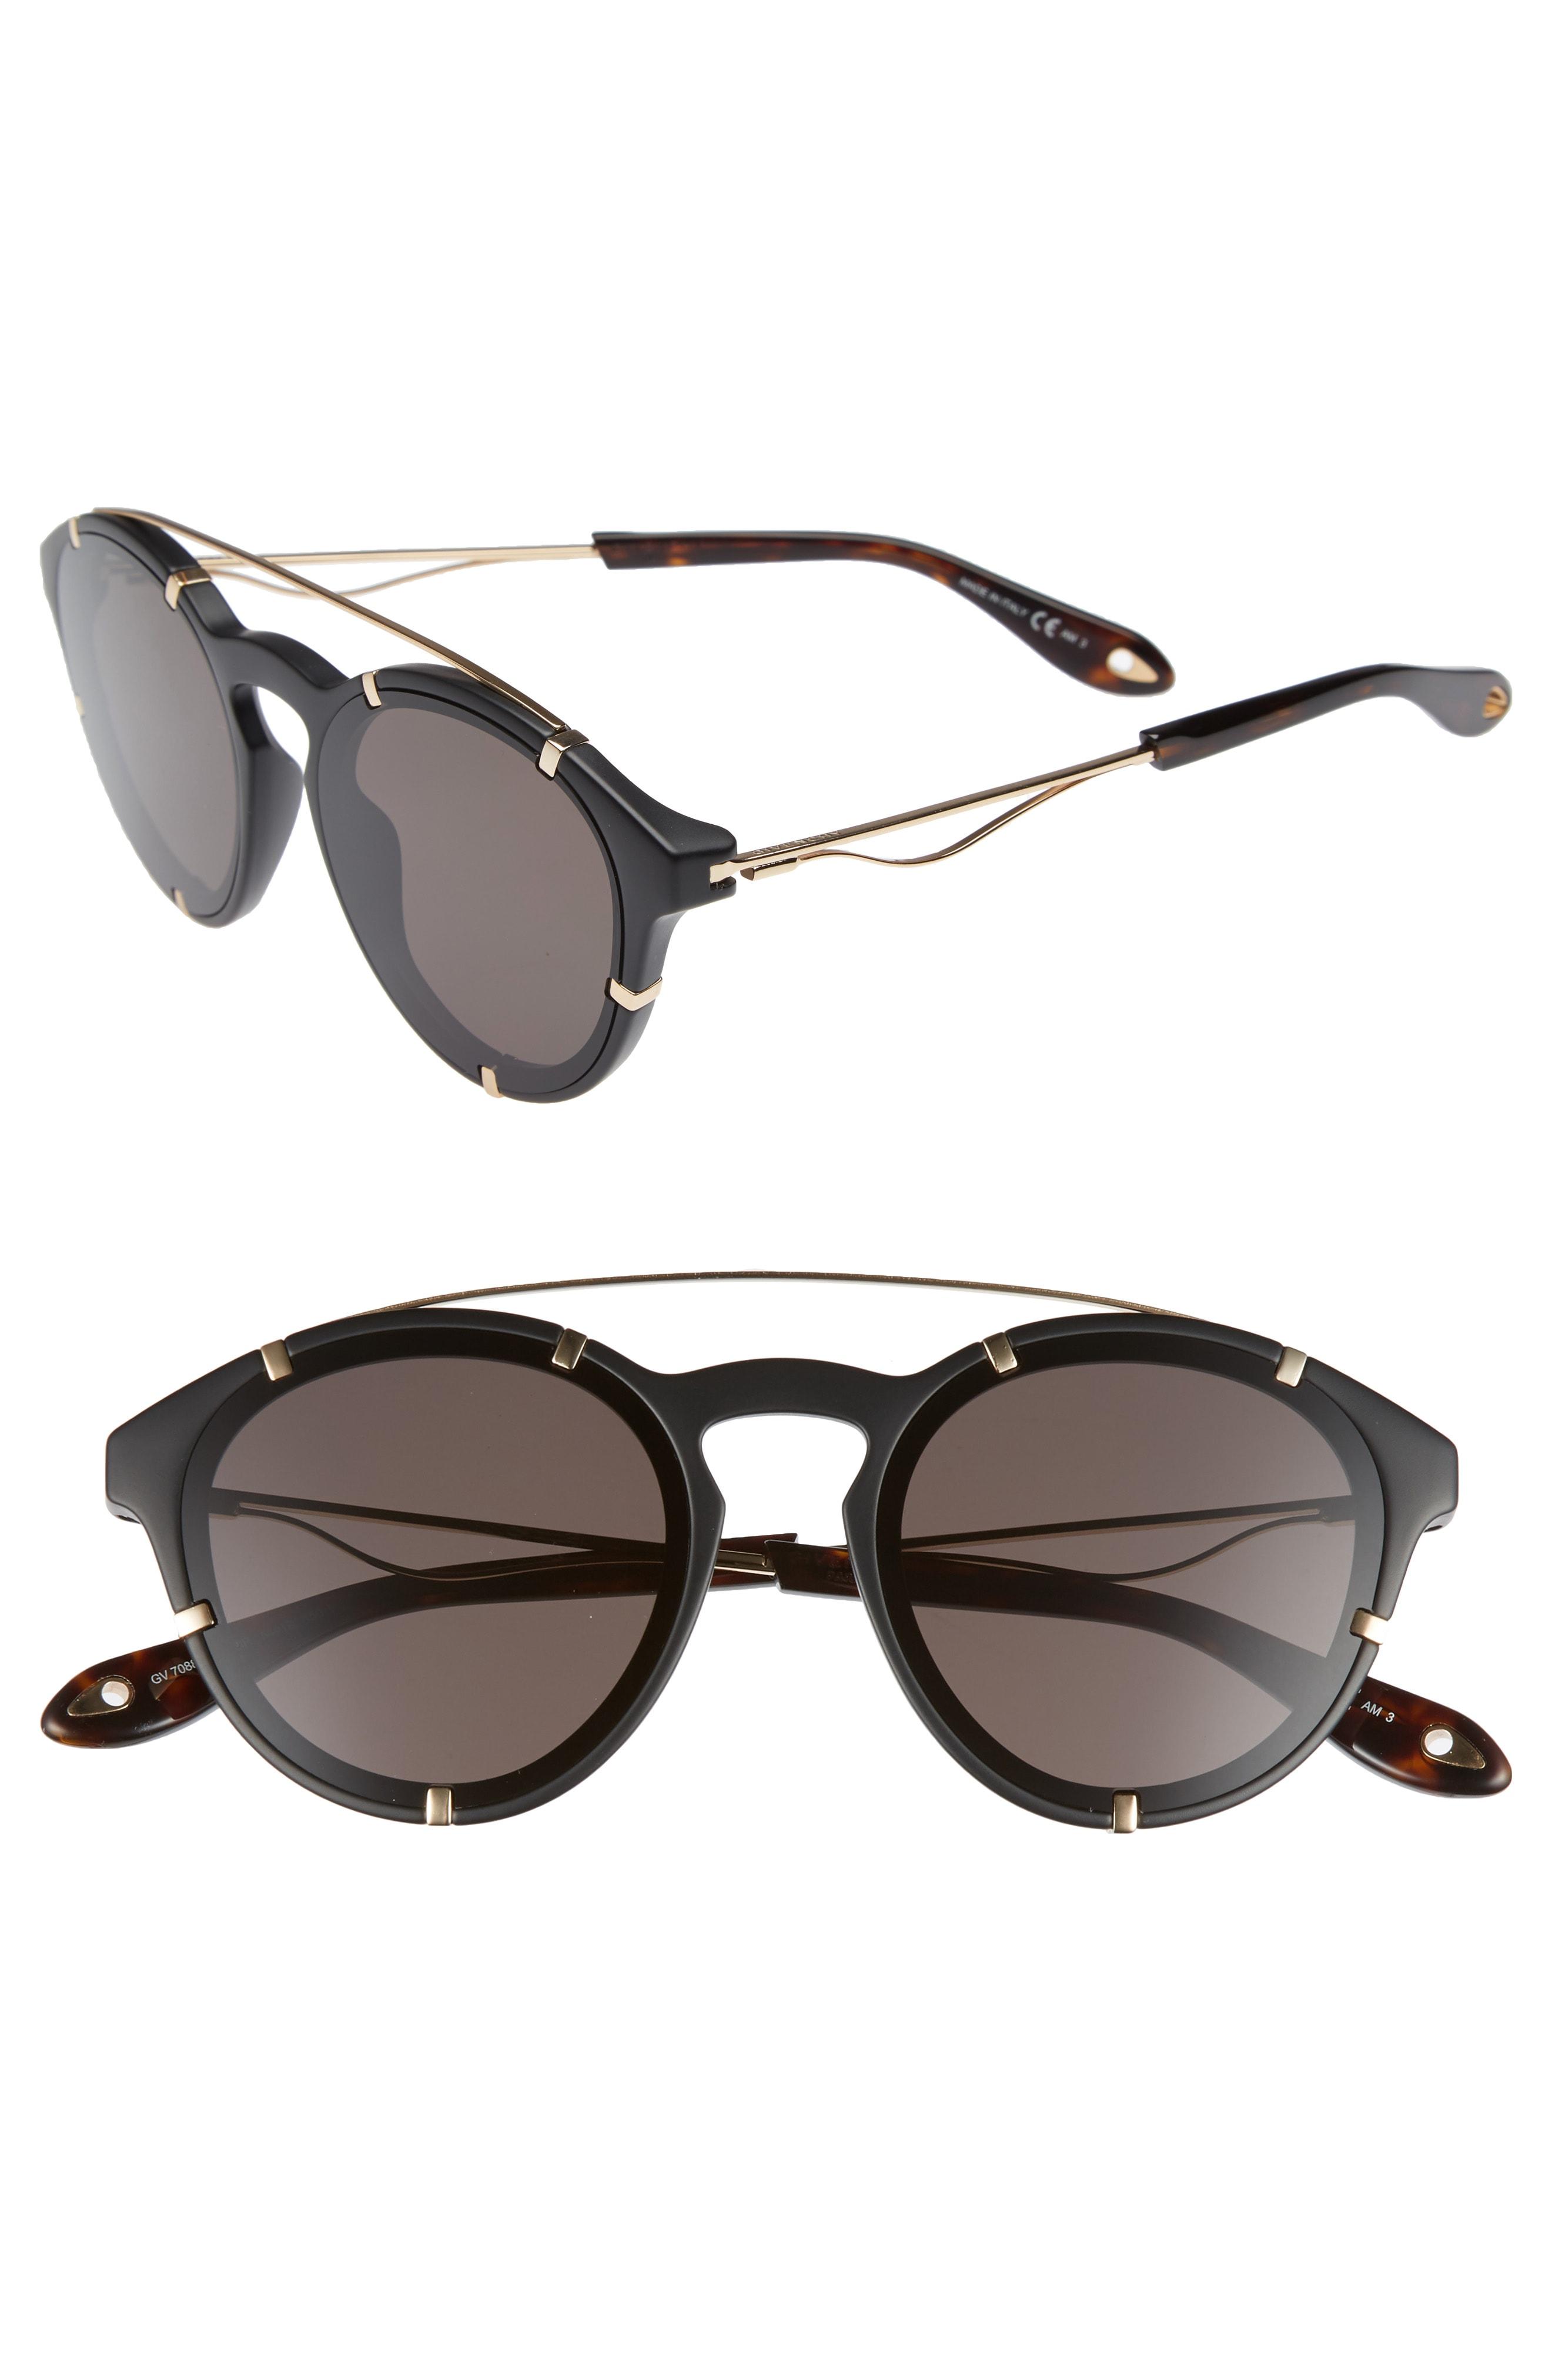 Givenchy 54mm Round Polarized Sunglasses